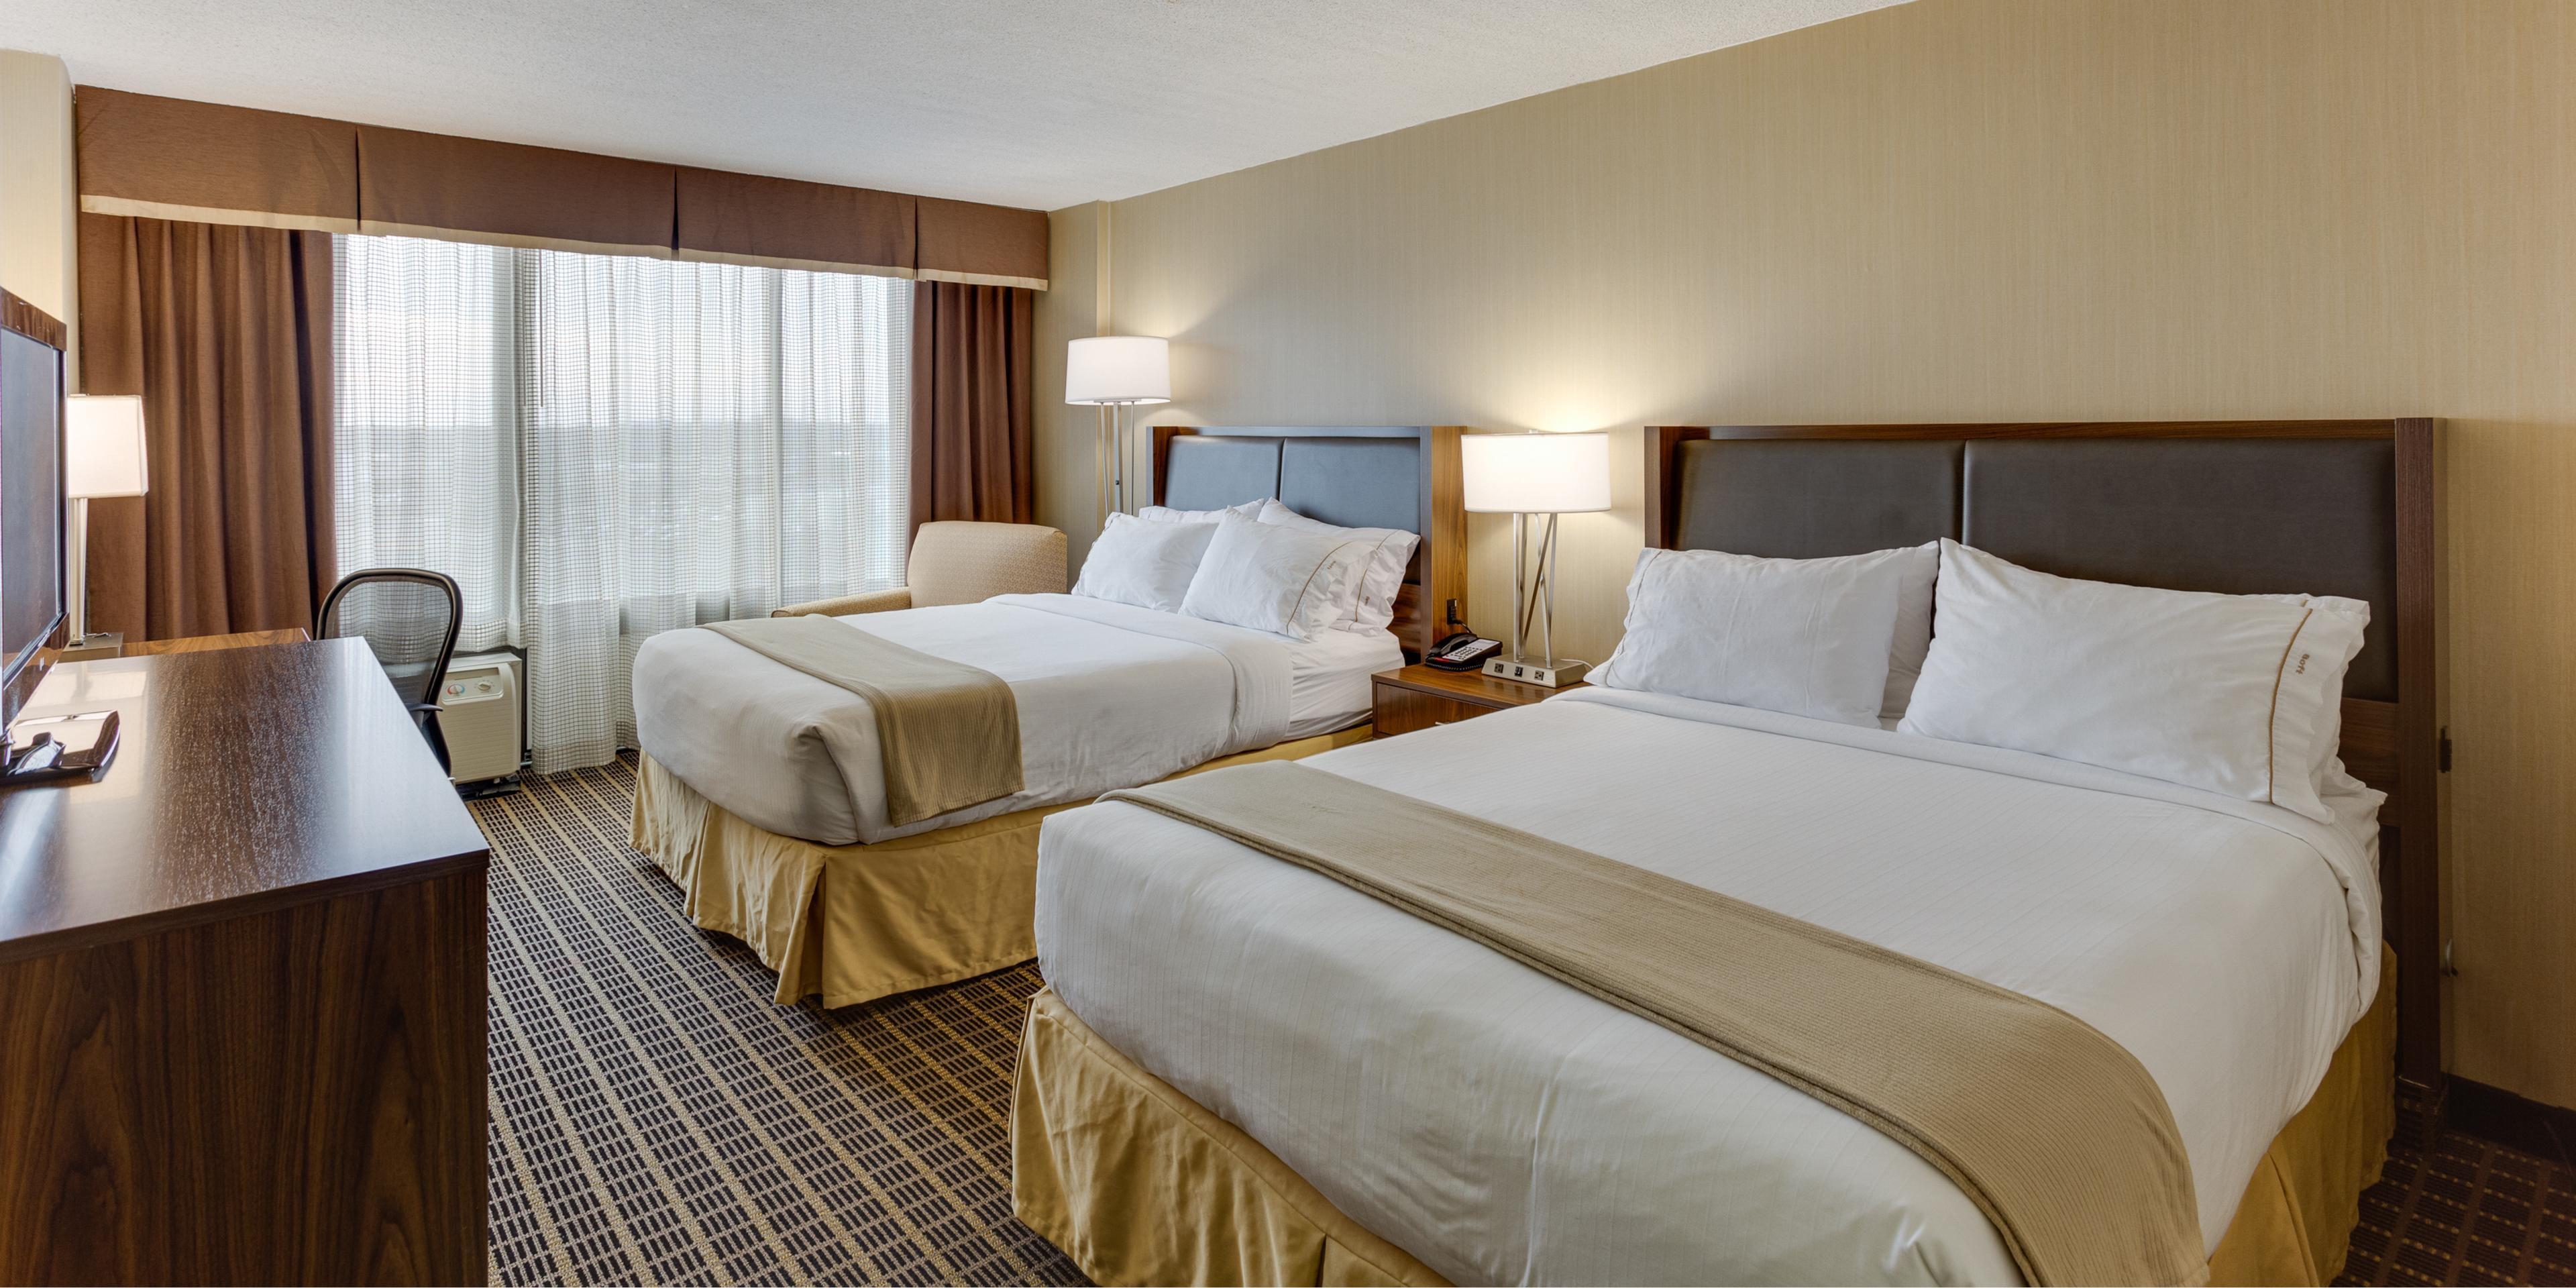 holiday inn express washington dc sw springfield hotel by ihg holiday inn express springfield 3477661268 2x1